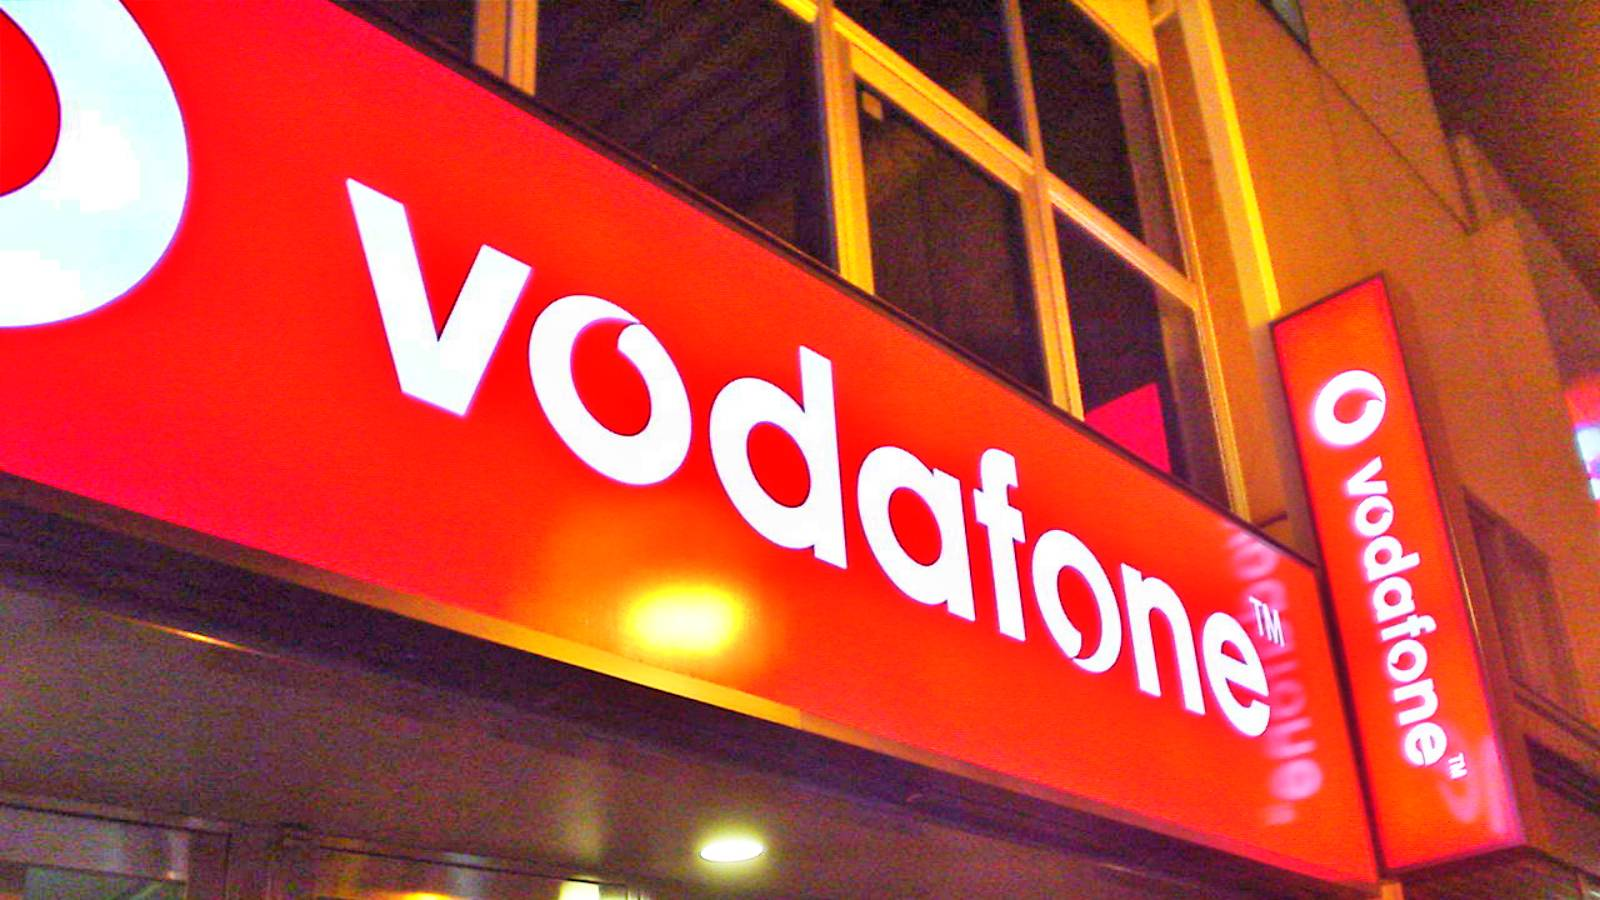 Vodafone atragere